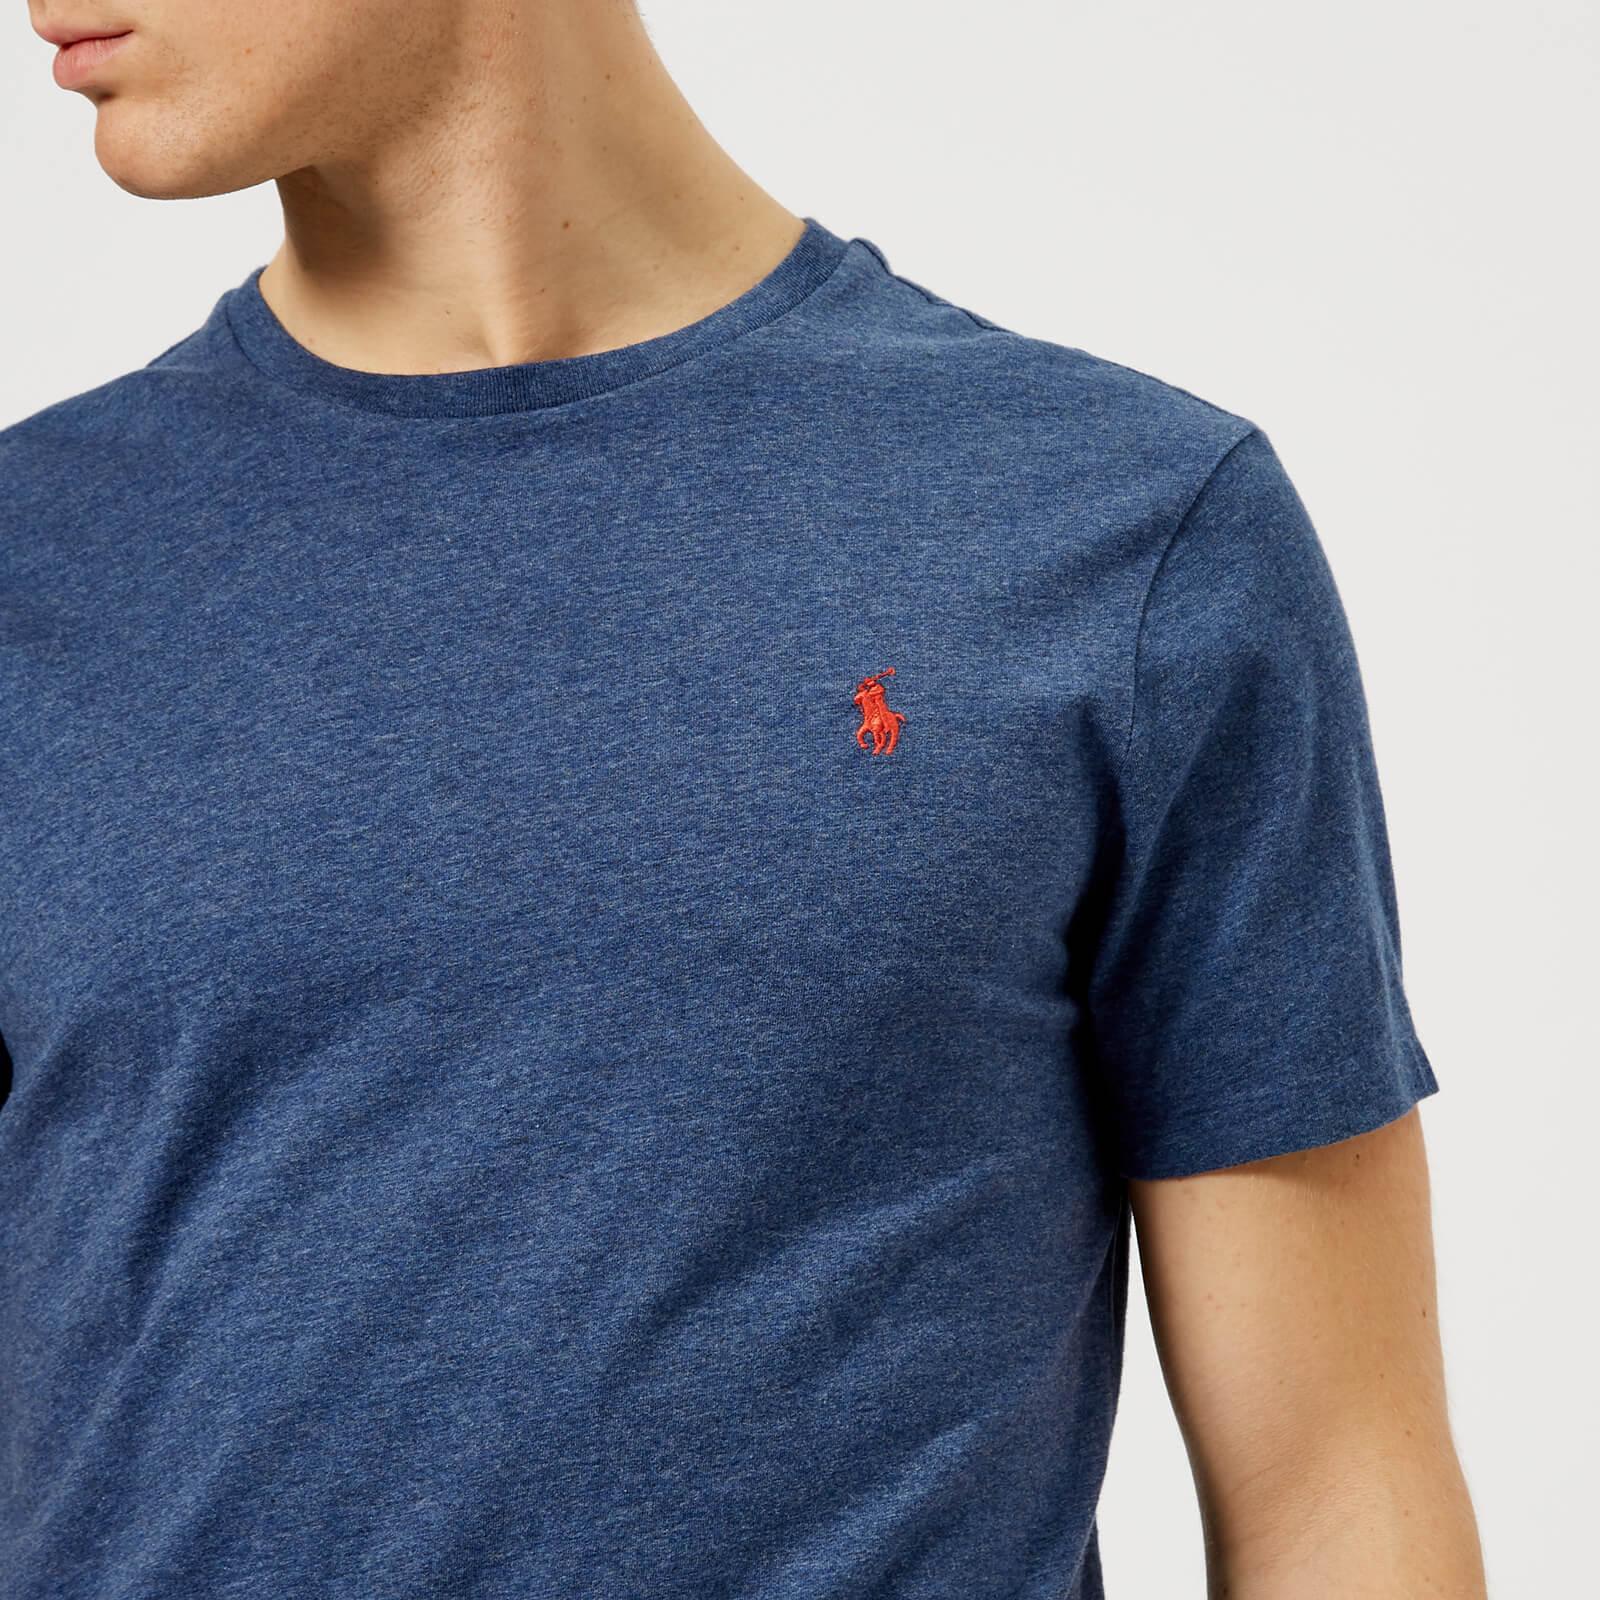 78514b50d Polo Ralph Lauren Men's Basic Crew Neck T-Shirt - Rustic Navy Heather -  Free UK Delivery over £50